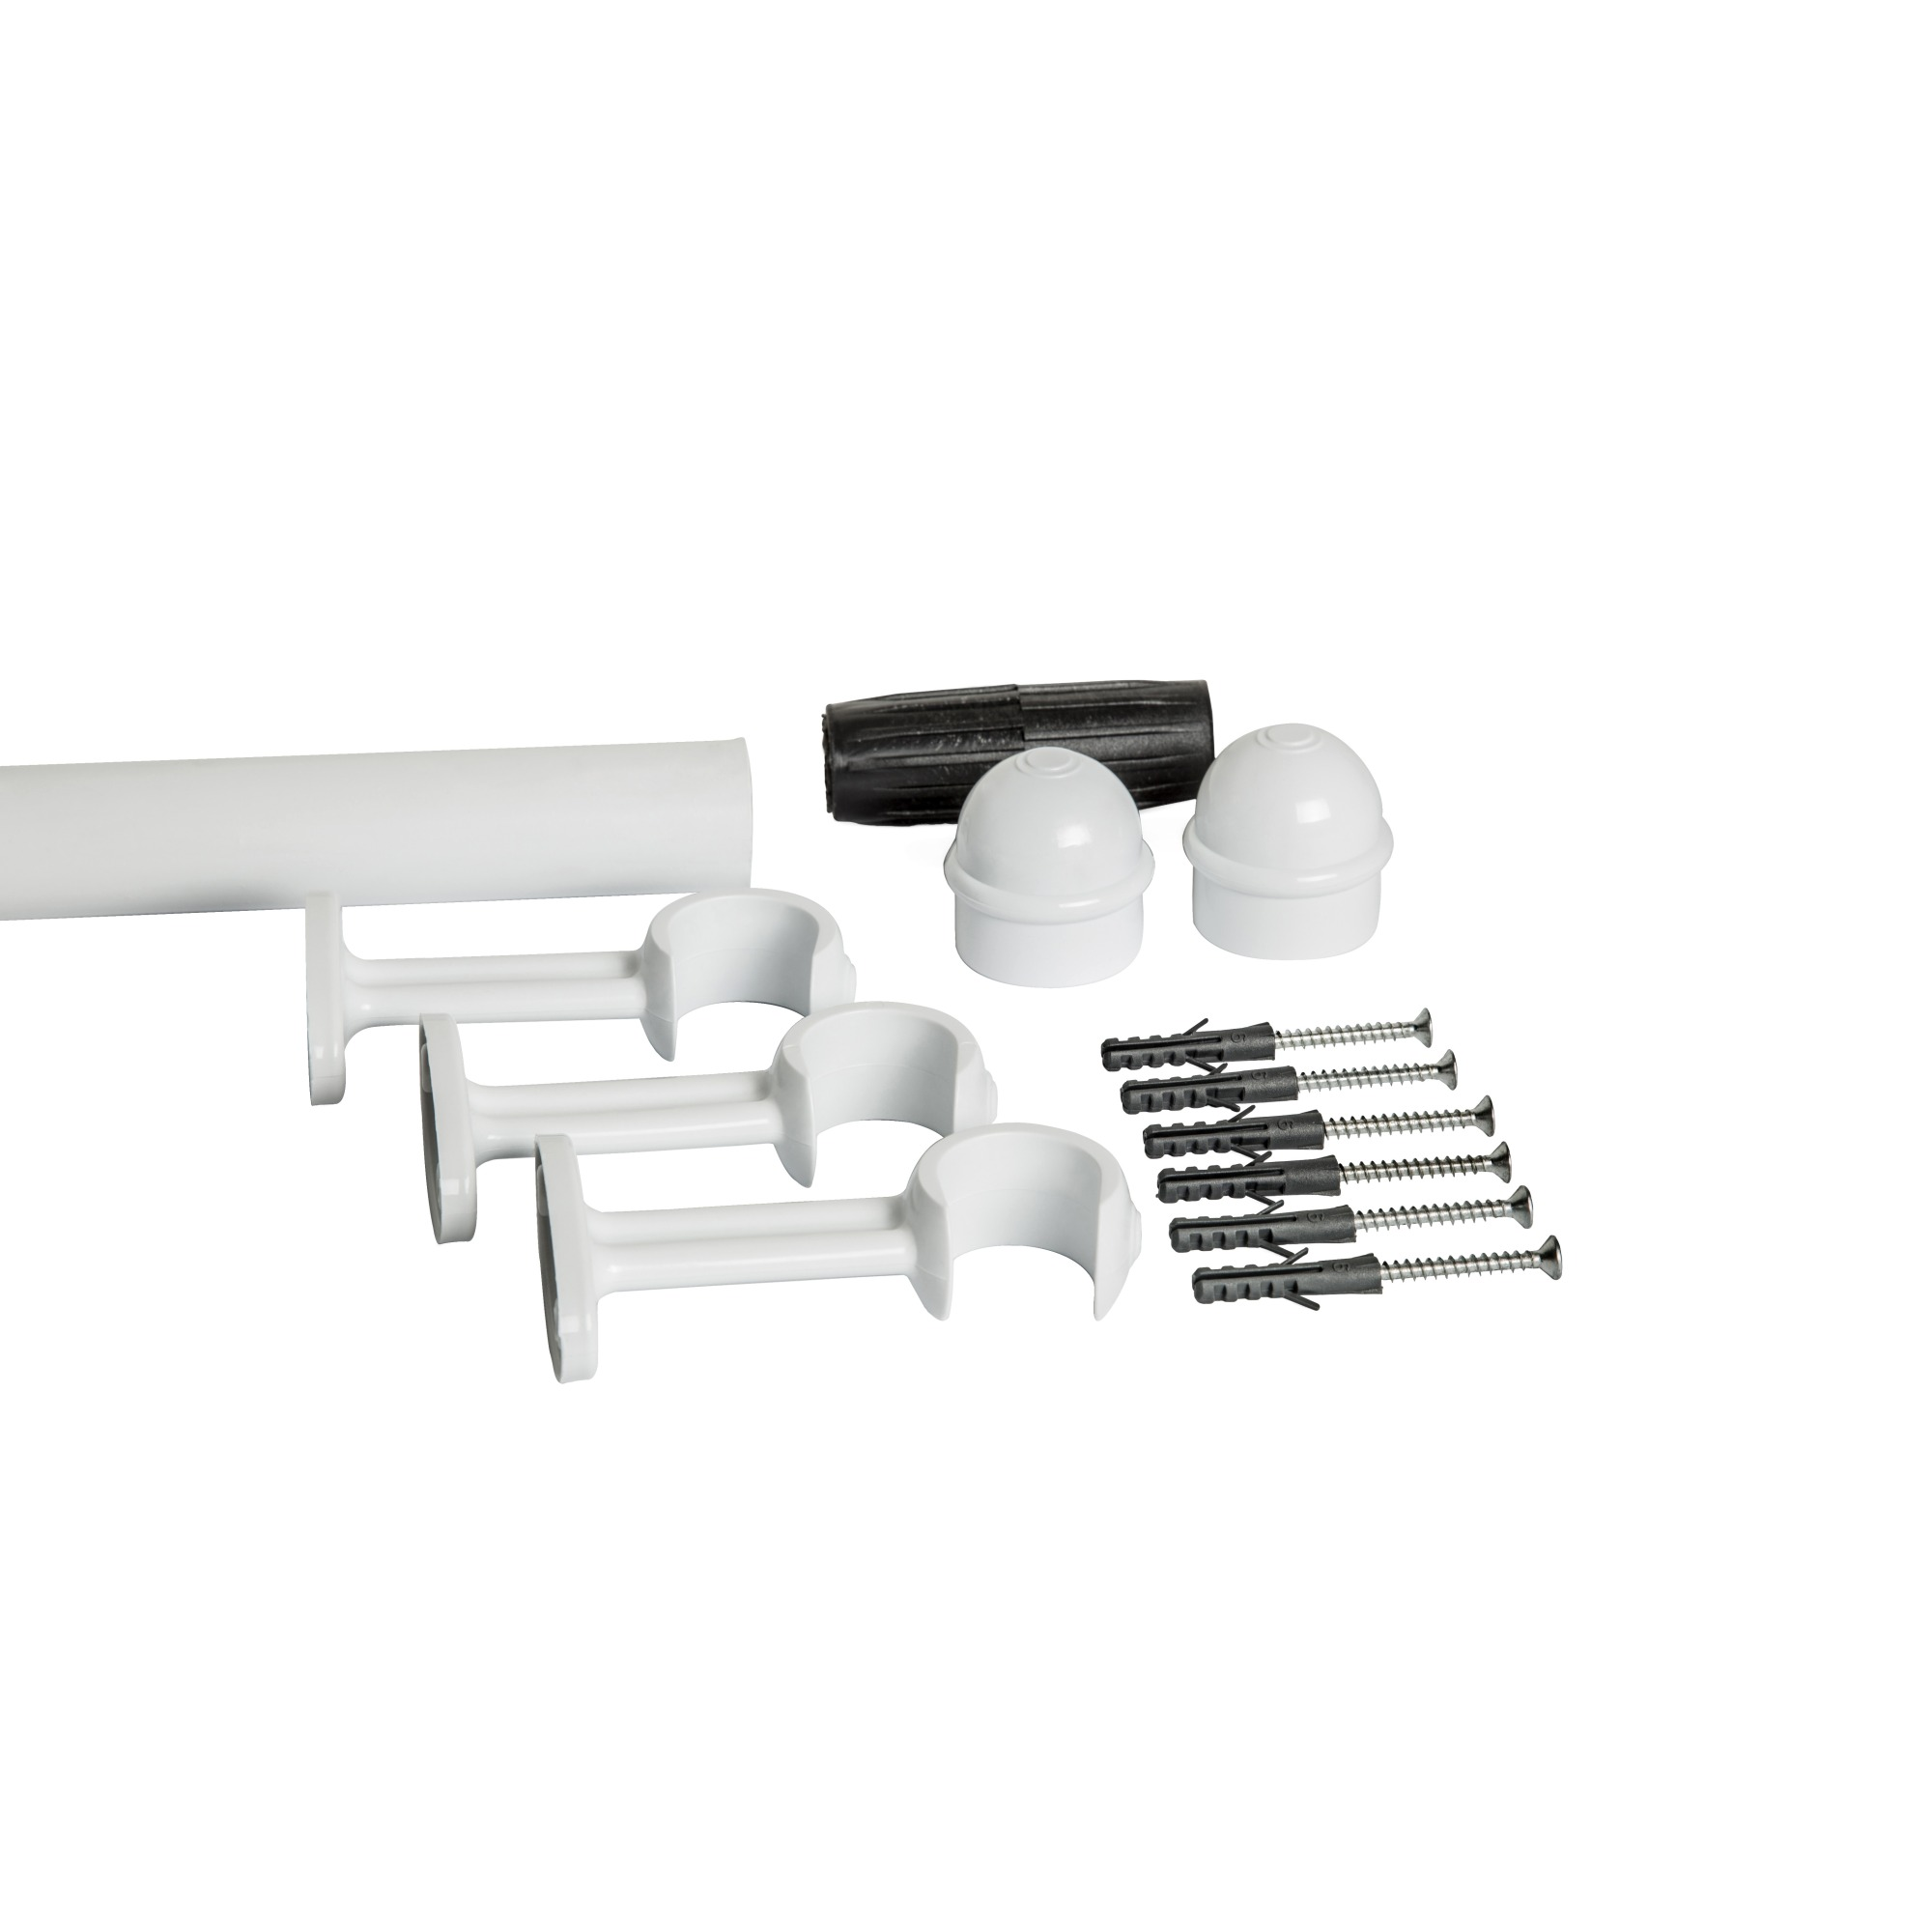 Kit Varao para Cortina 175m x 19mm Clean Branco 831104 - STD Home